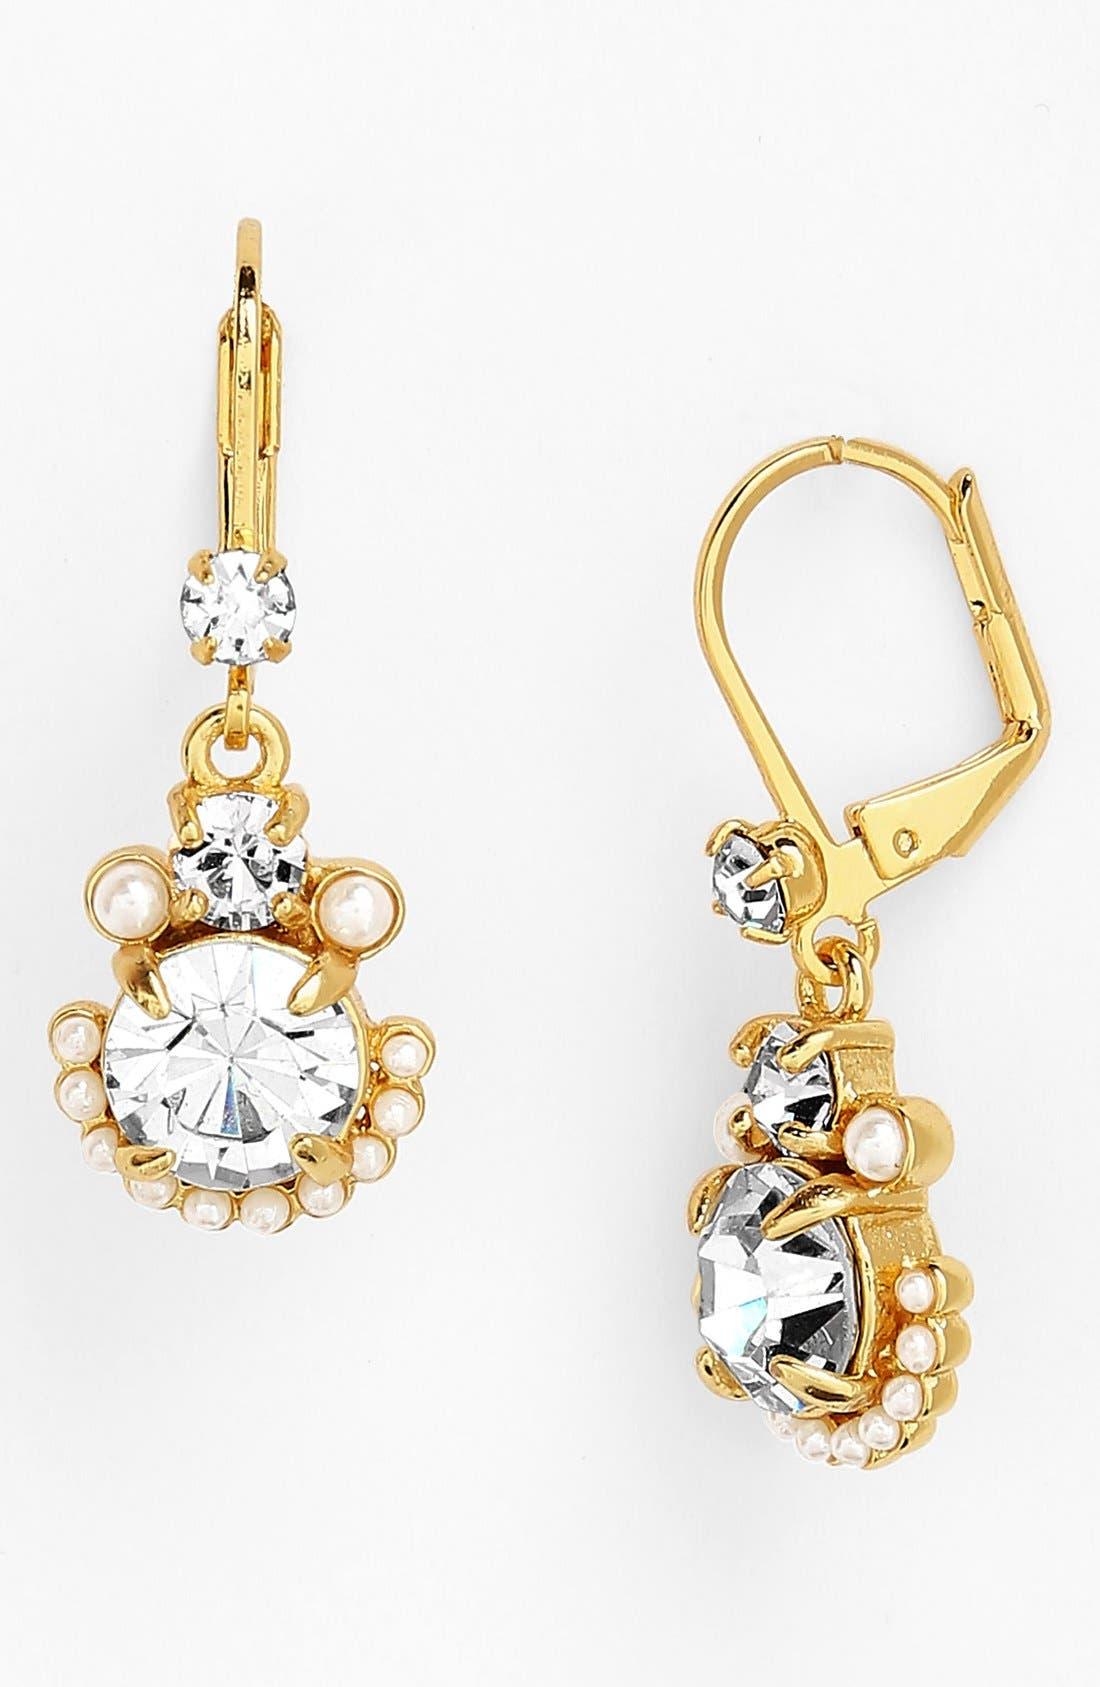 Main Image - kate spade new york 'palace gems' drop earrings